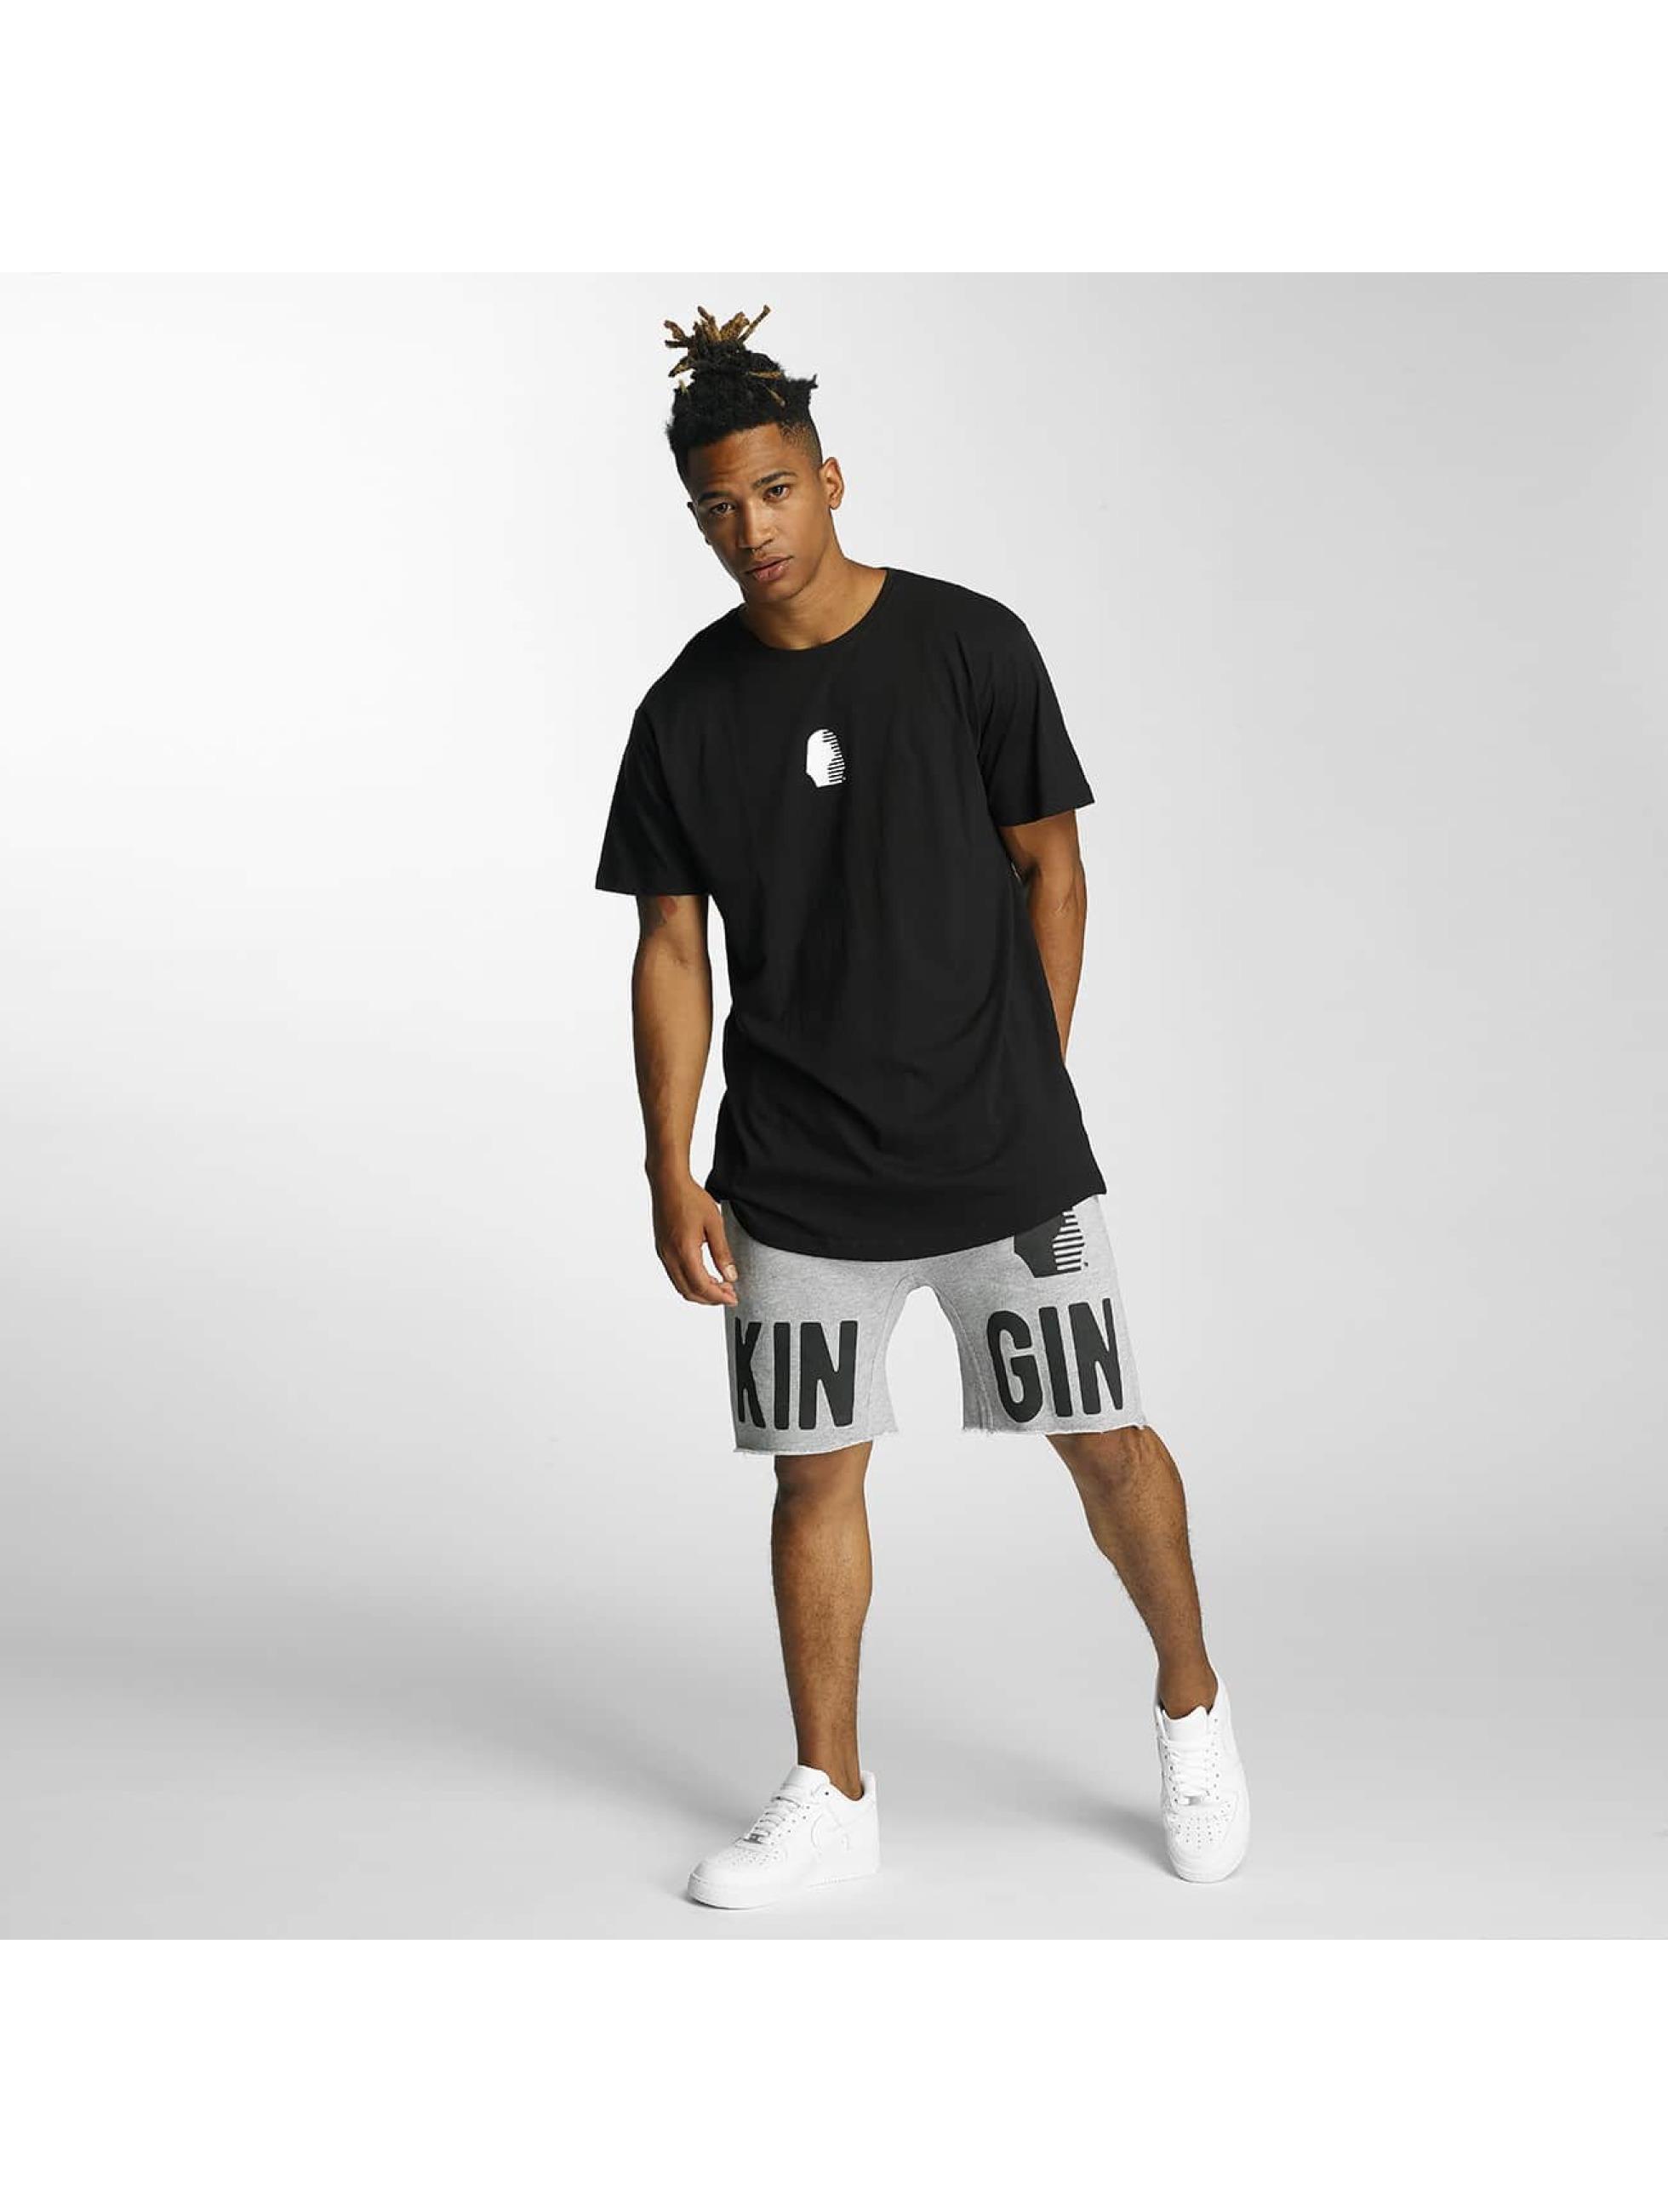 Kingin Camiseta Comp. negro